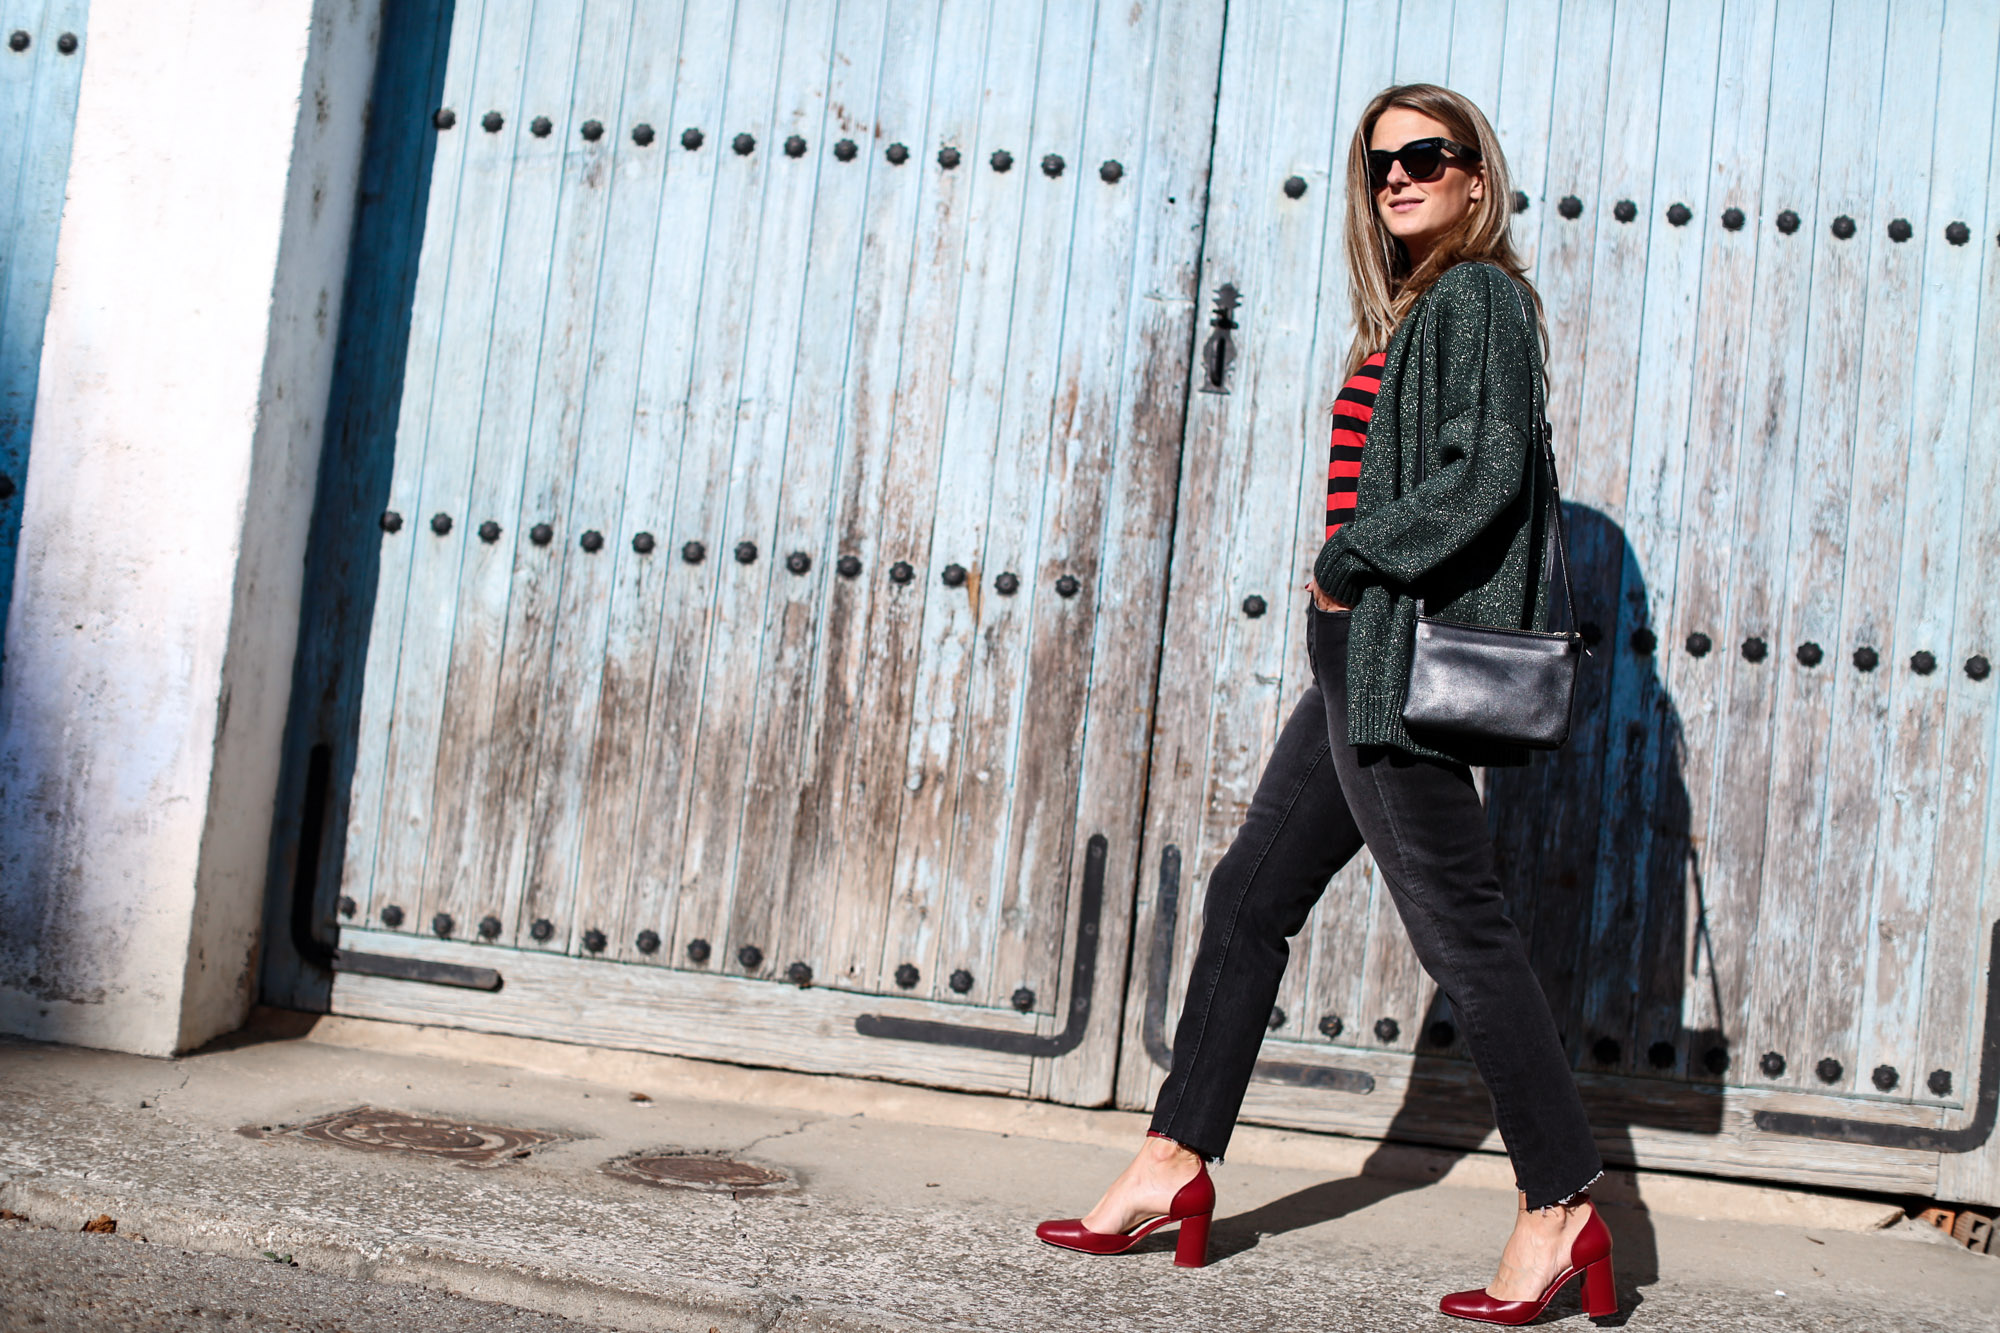 clochet_streetstyle_fashionblogger_zapatostaconrojospielzara_bolsotrioceline_momjeansh&m-2